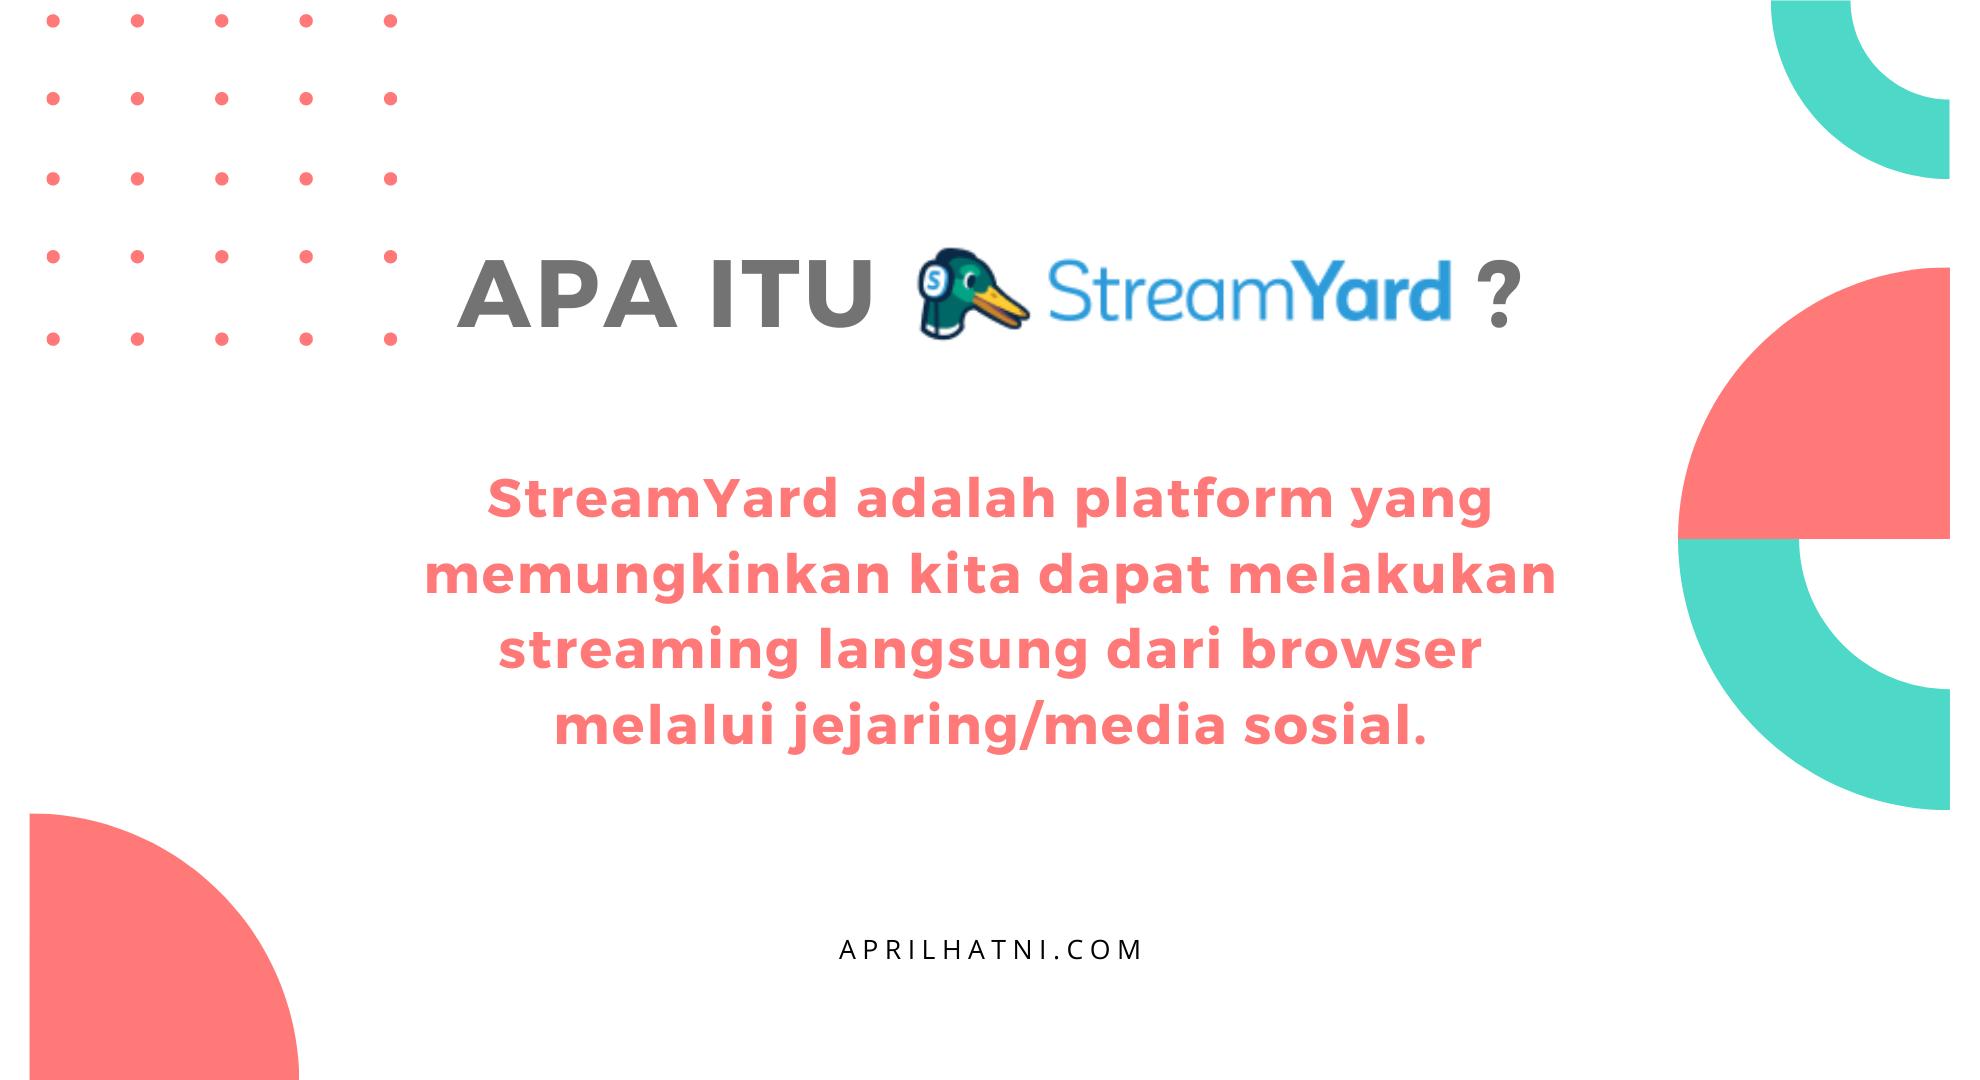 apa itu streamyard